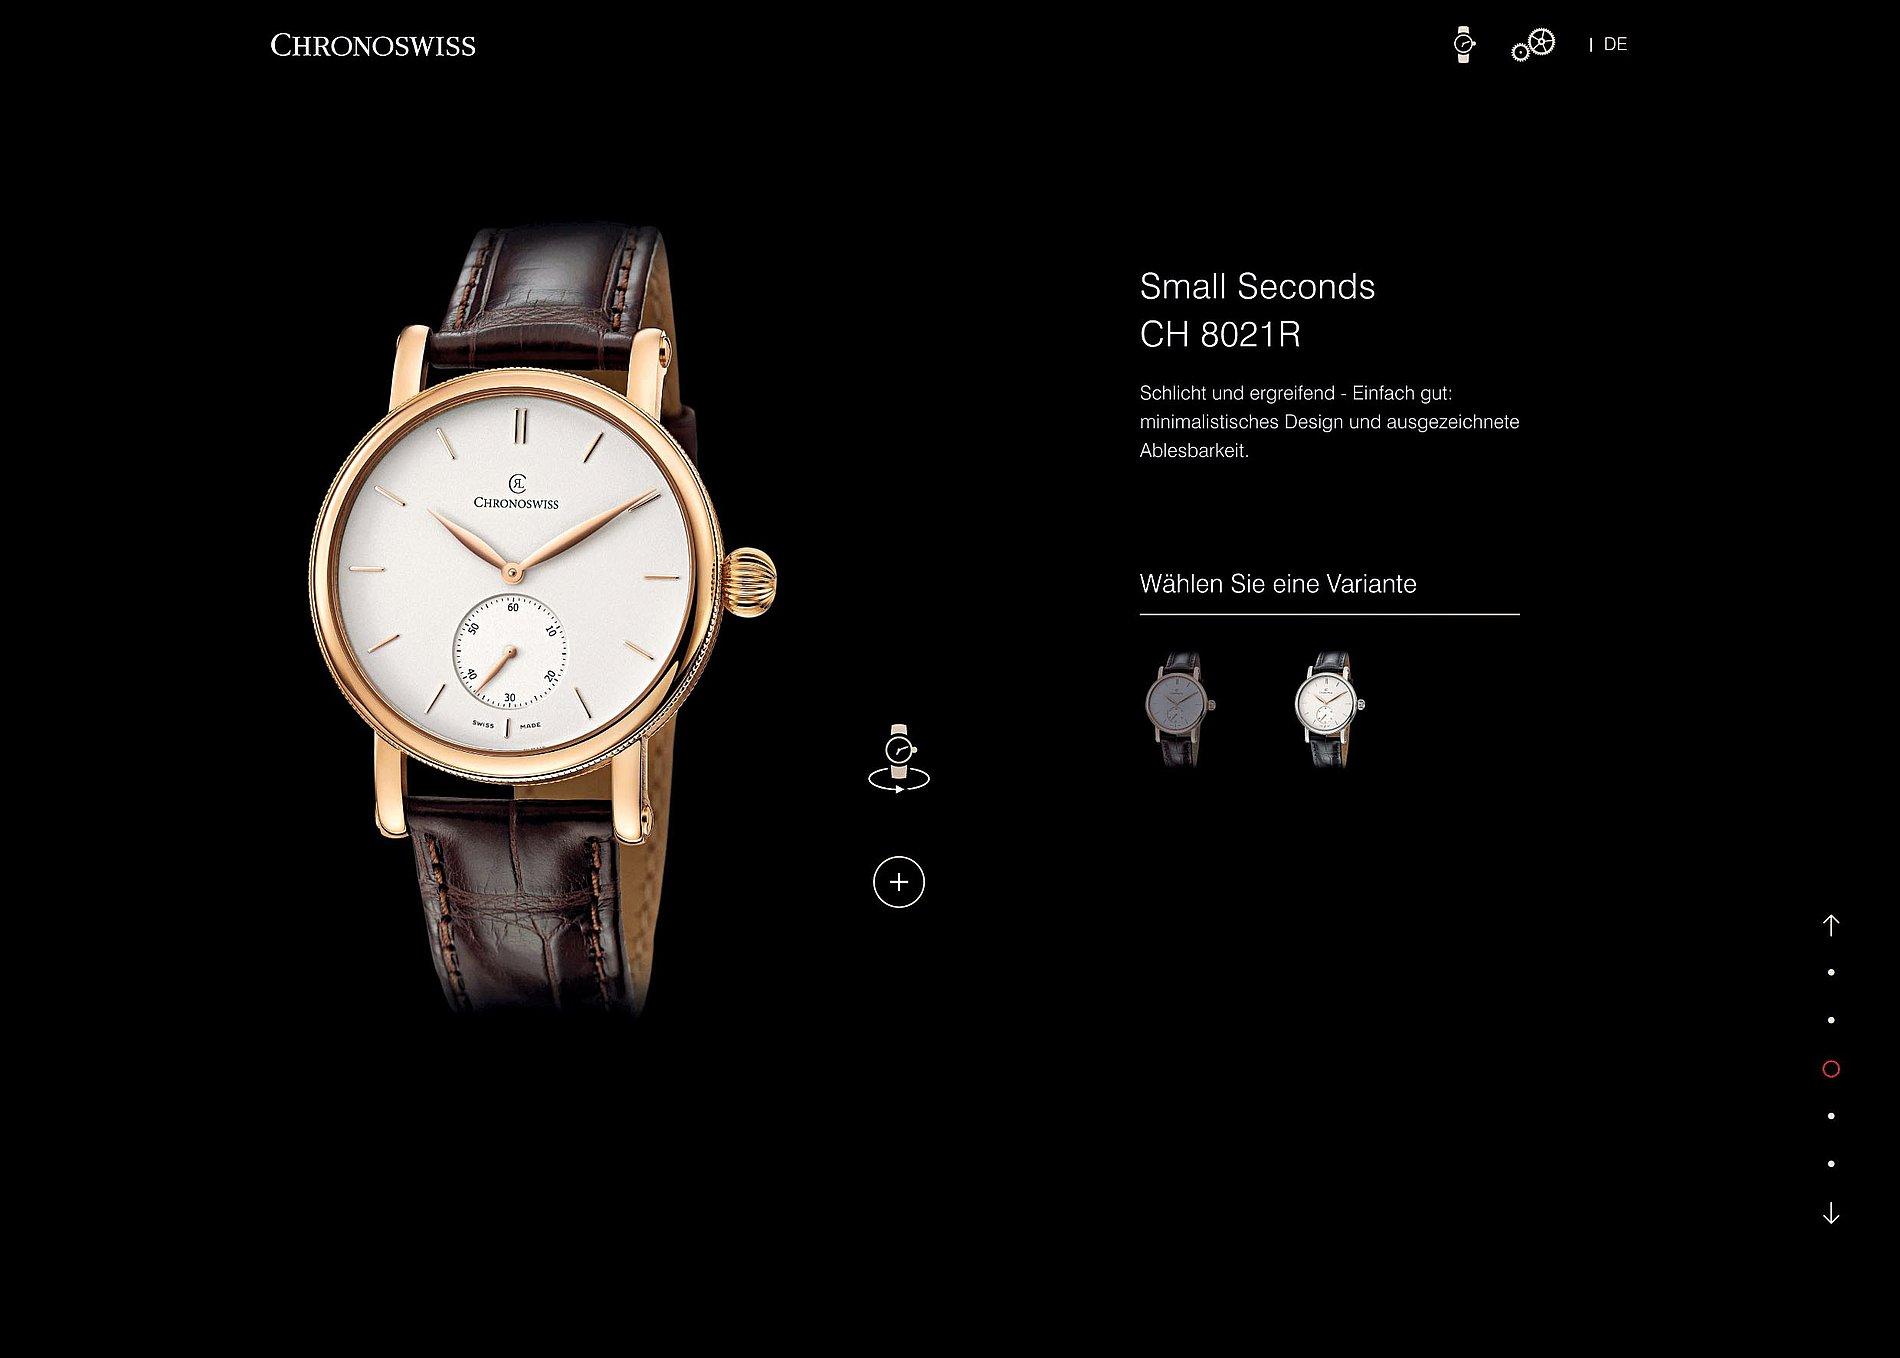 Chronoswiss | Red Dot Design Award